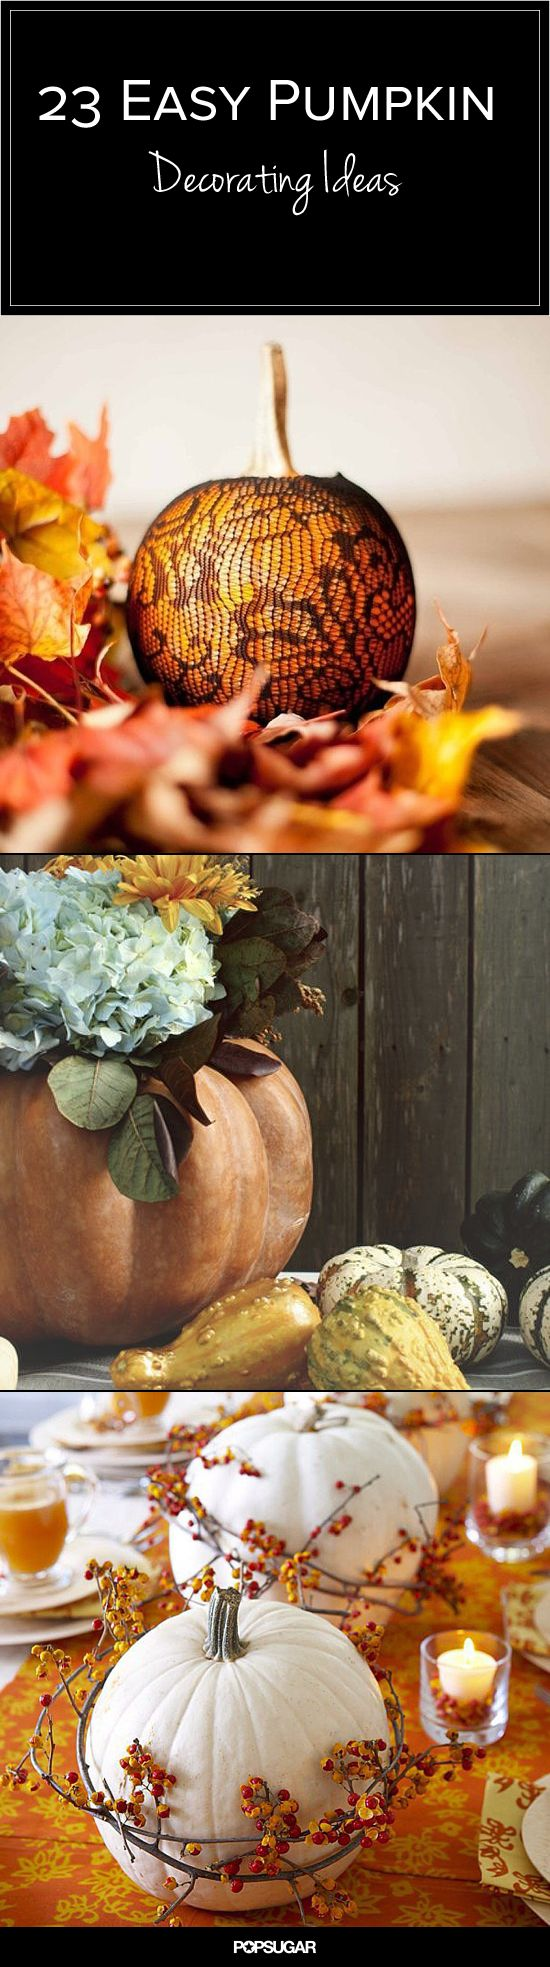 Easy pumpkin decorating ideas